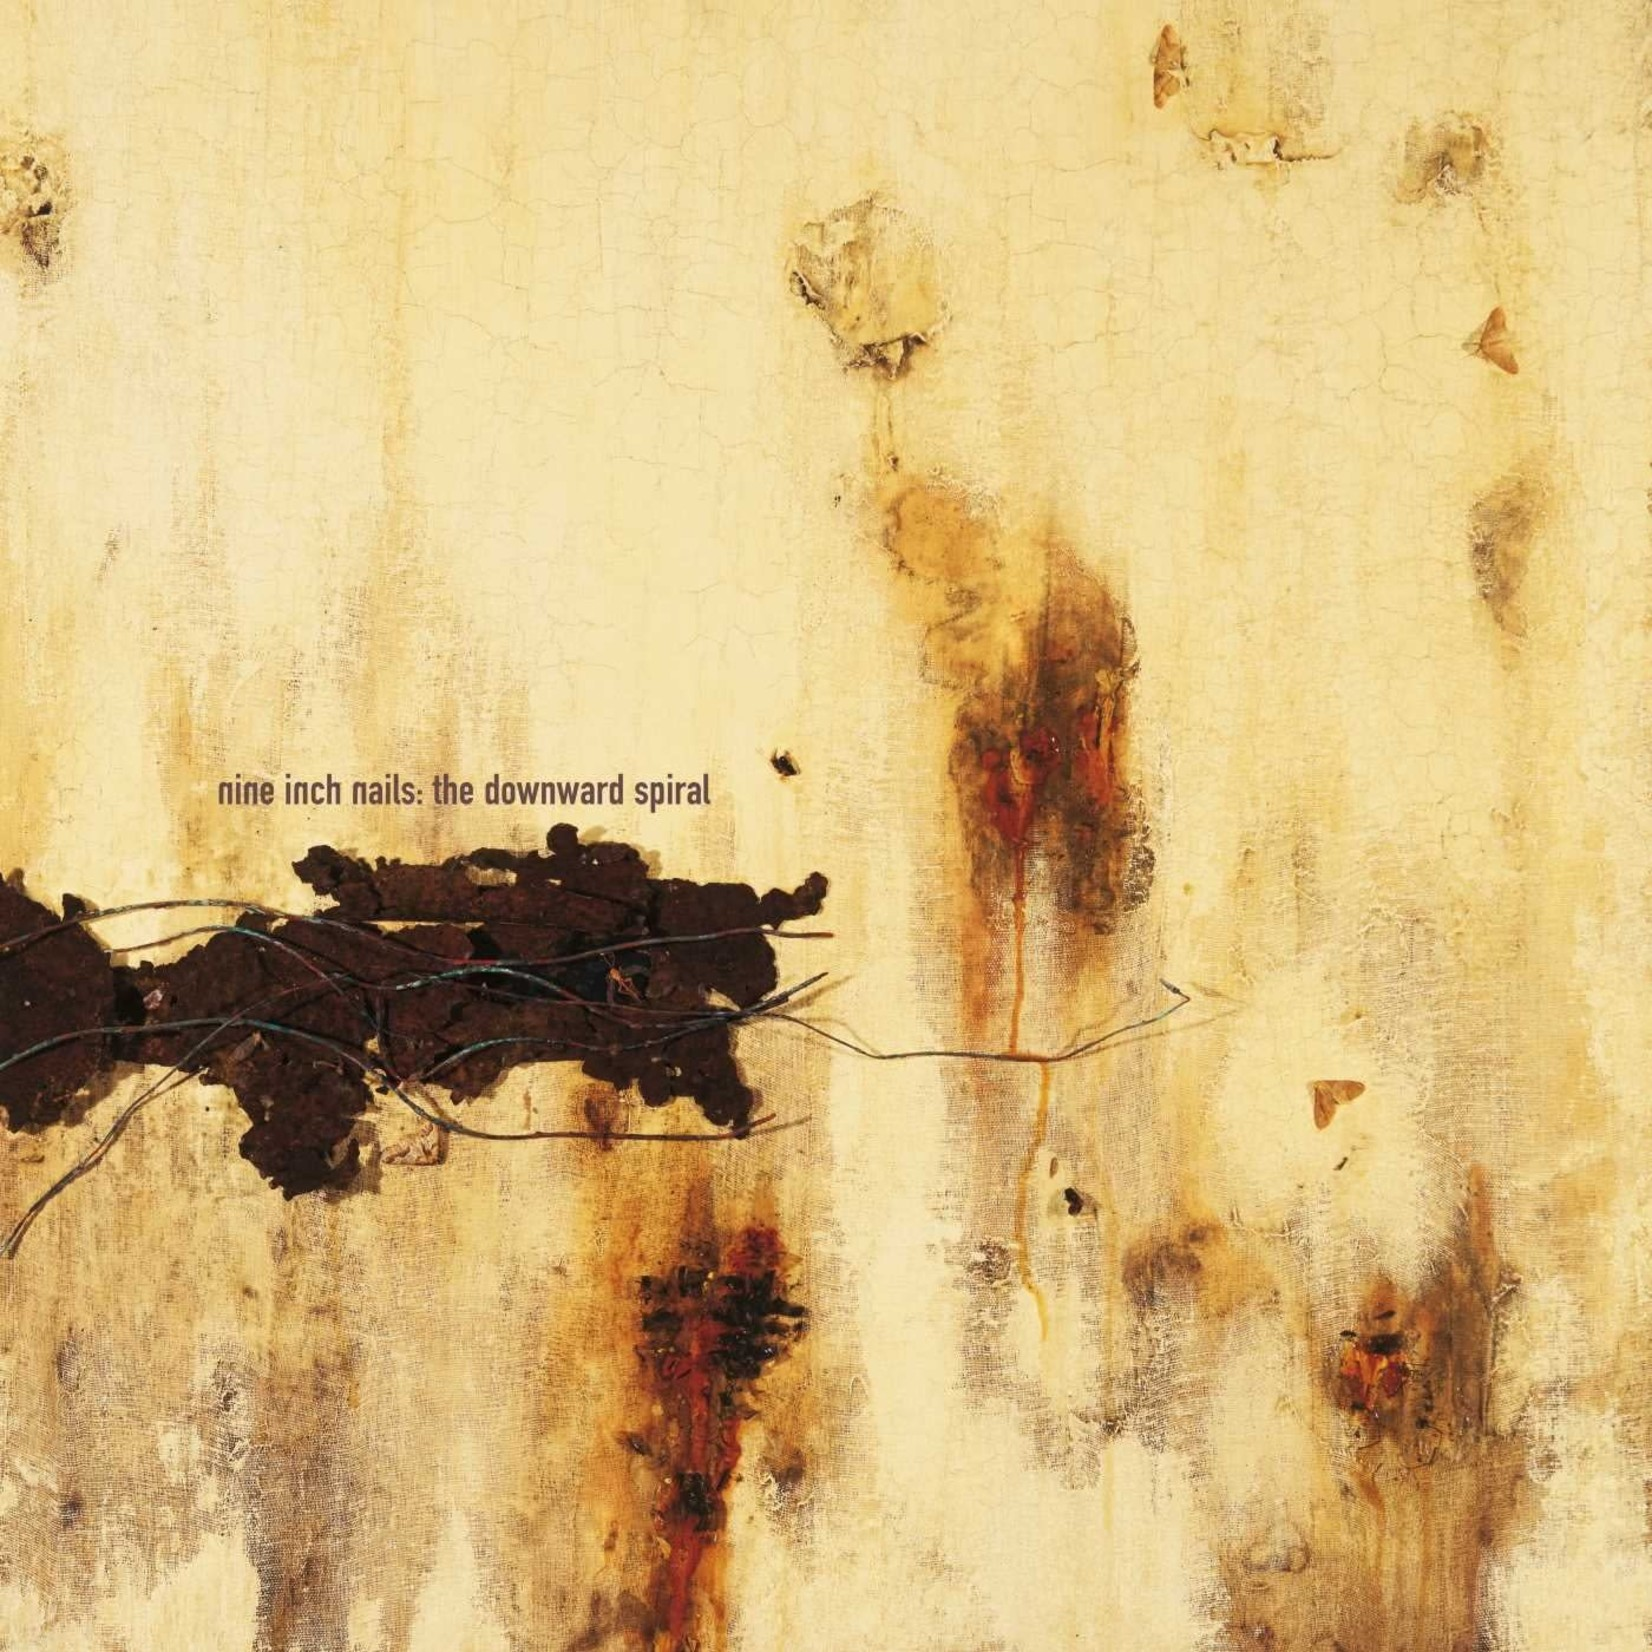 [New] Nine Inch Nails: The Downward Spiral (2LP)